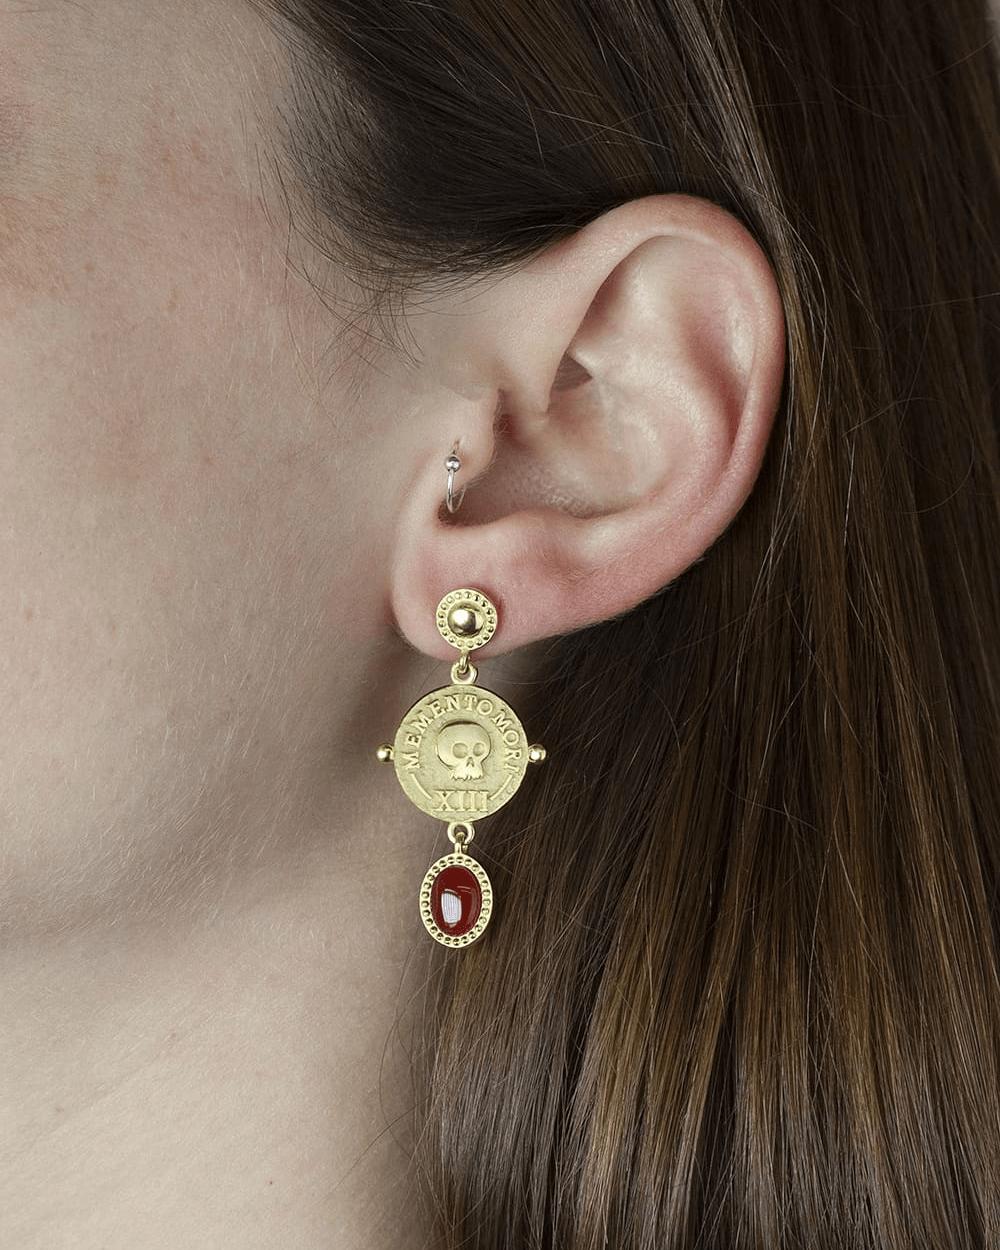 Earrings YELLOW GOLD MEMENTO MORI PAIR EARRINGS NOVE25